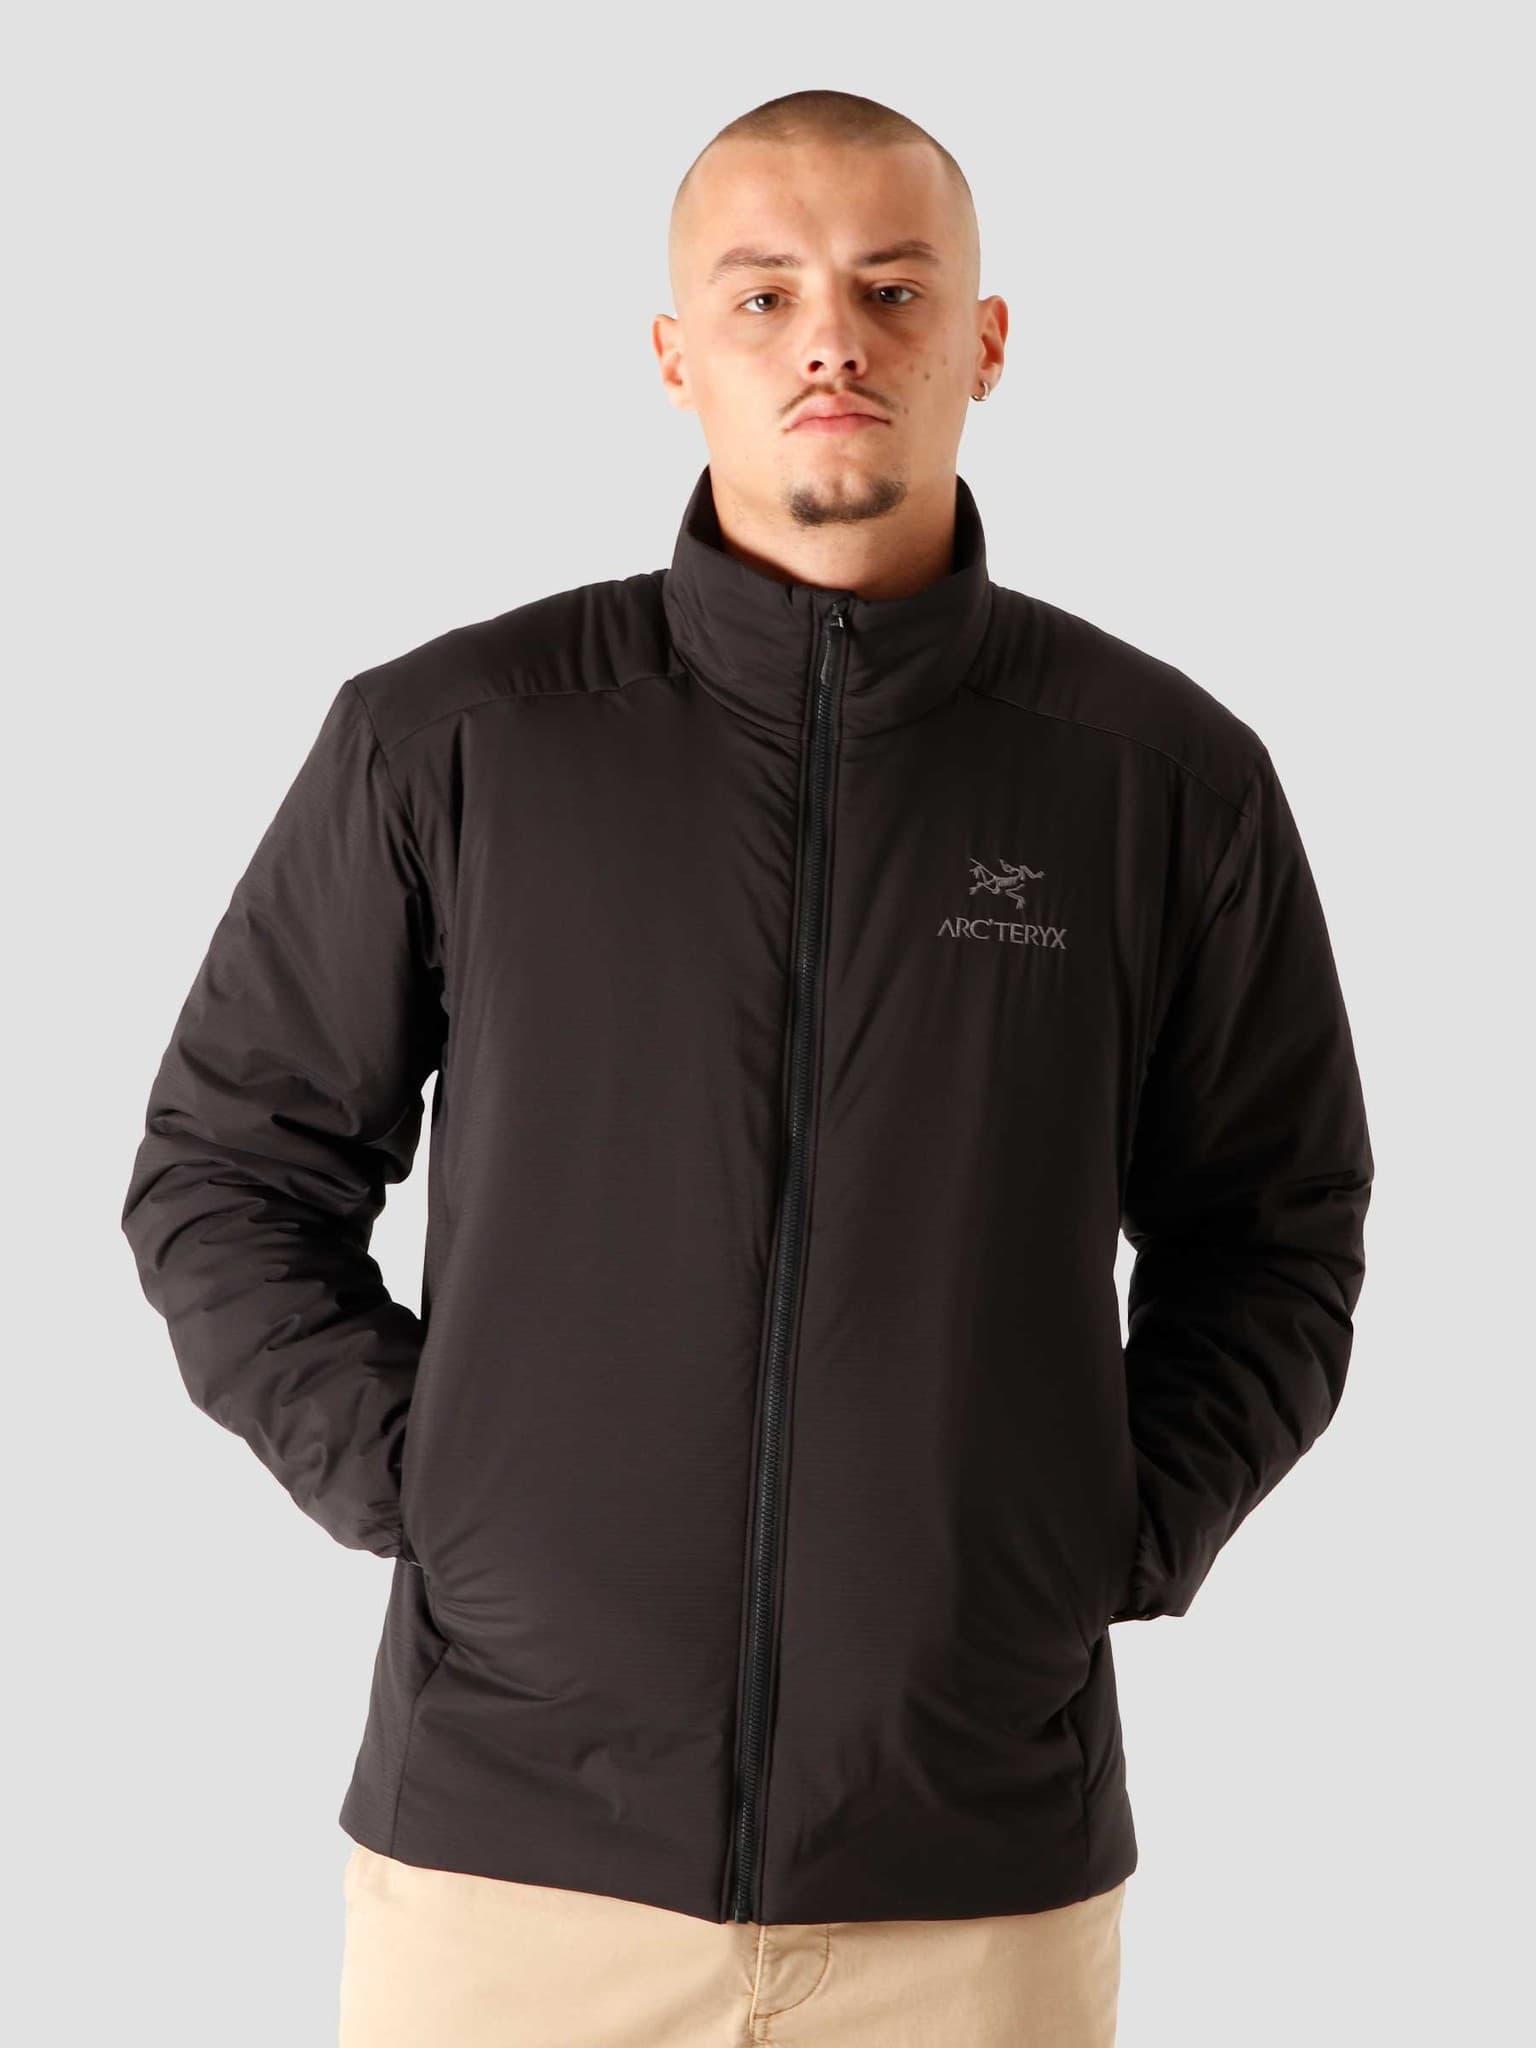 Atom AR Jacket Black 24106